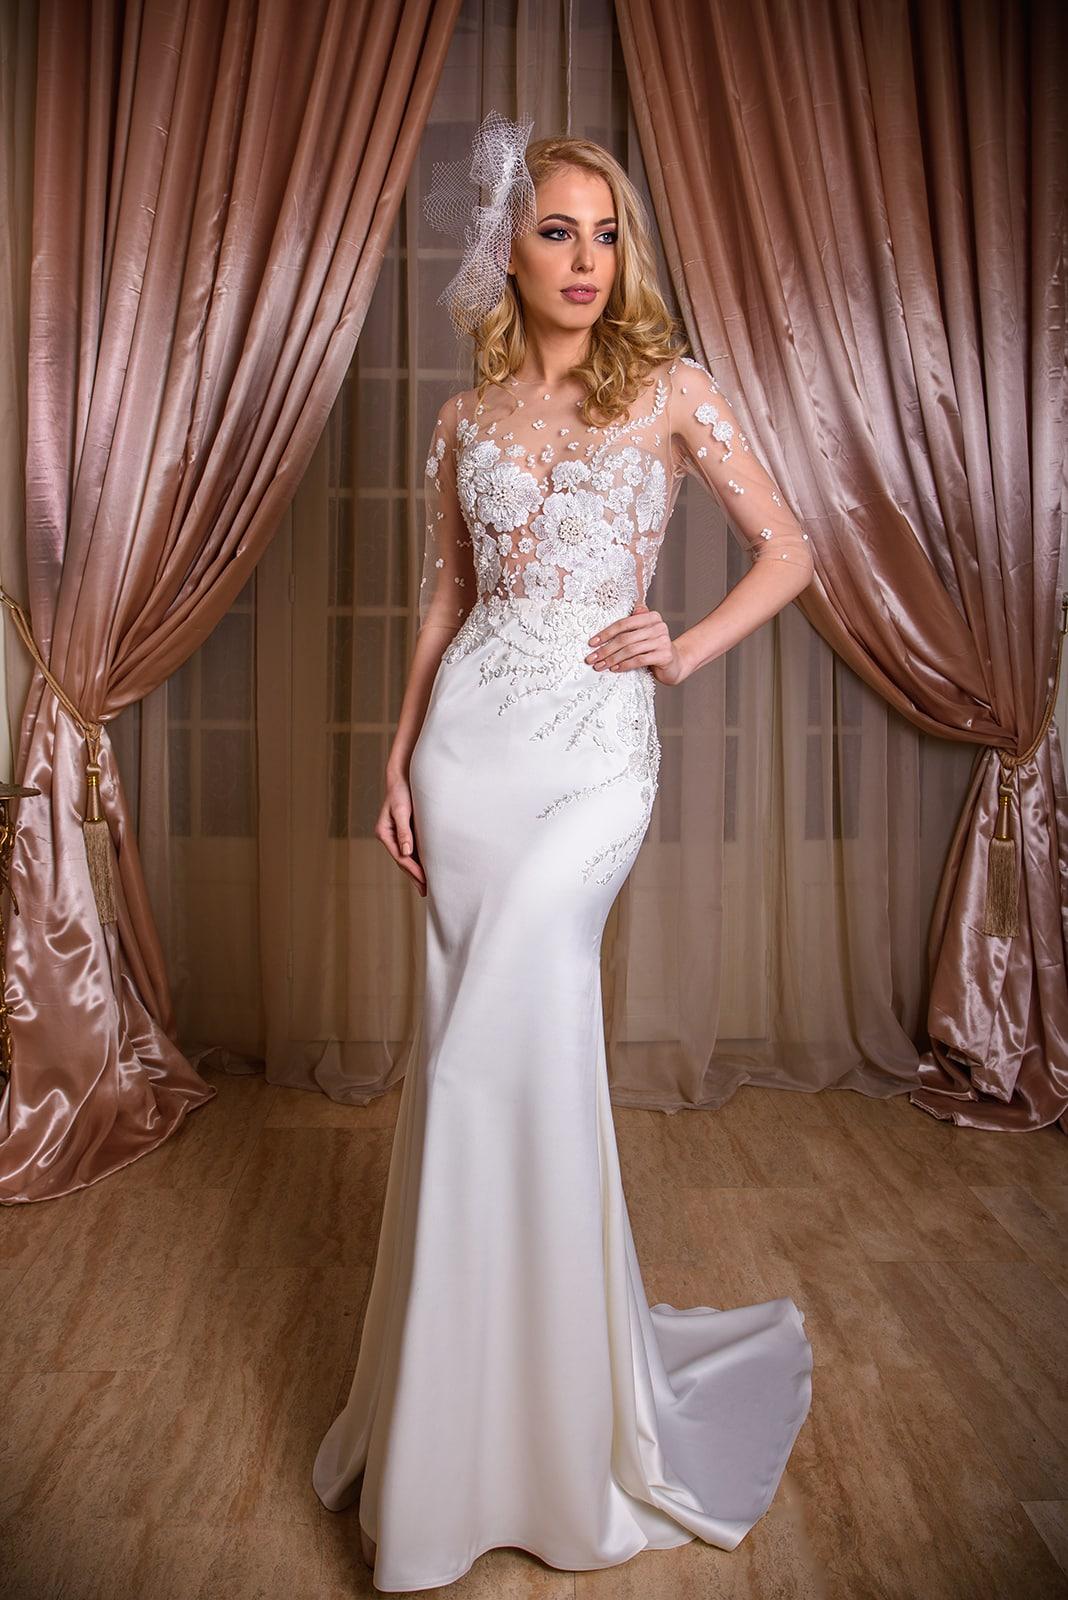 Nelda Model - Colectia Baroque - Adora Sposa